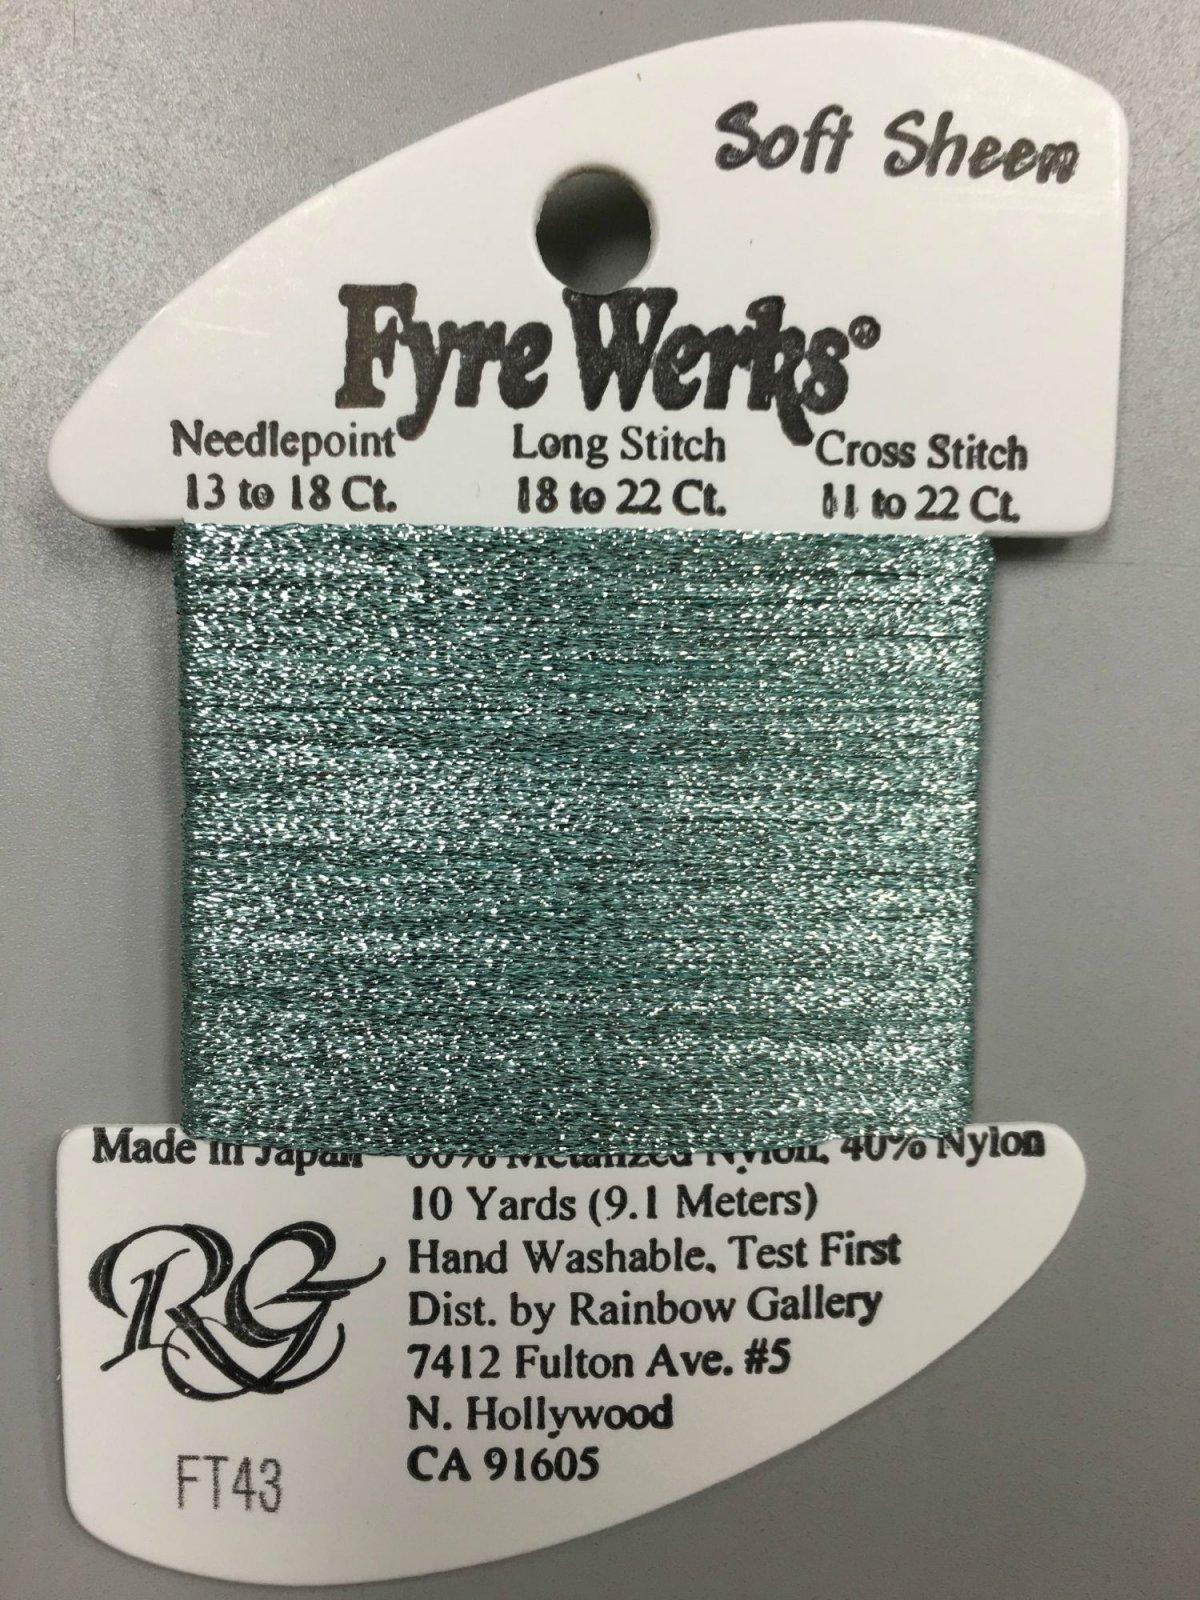 Fyre Werks Soft Sheen FT43